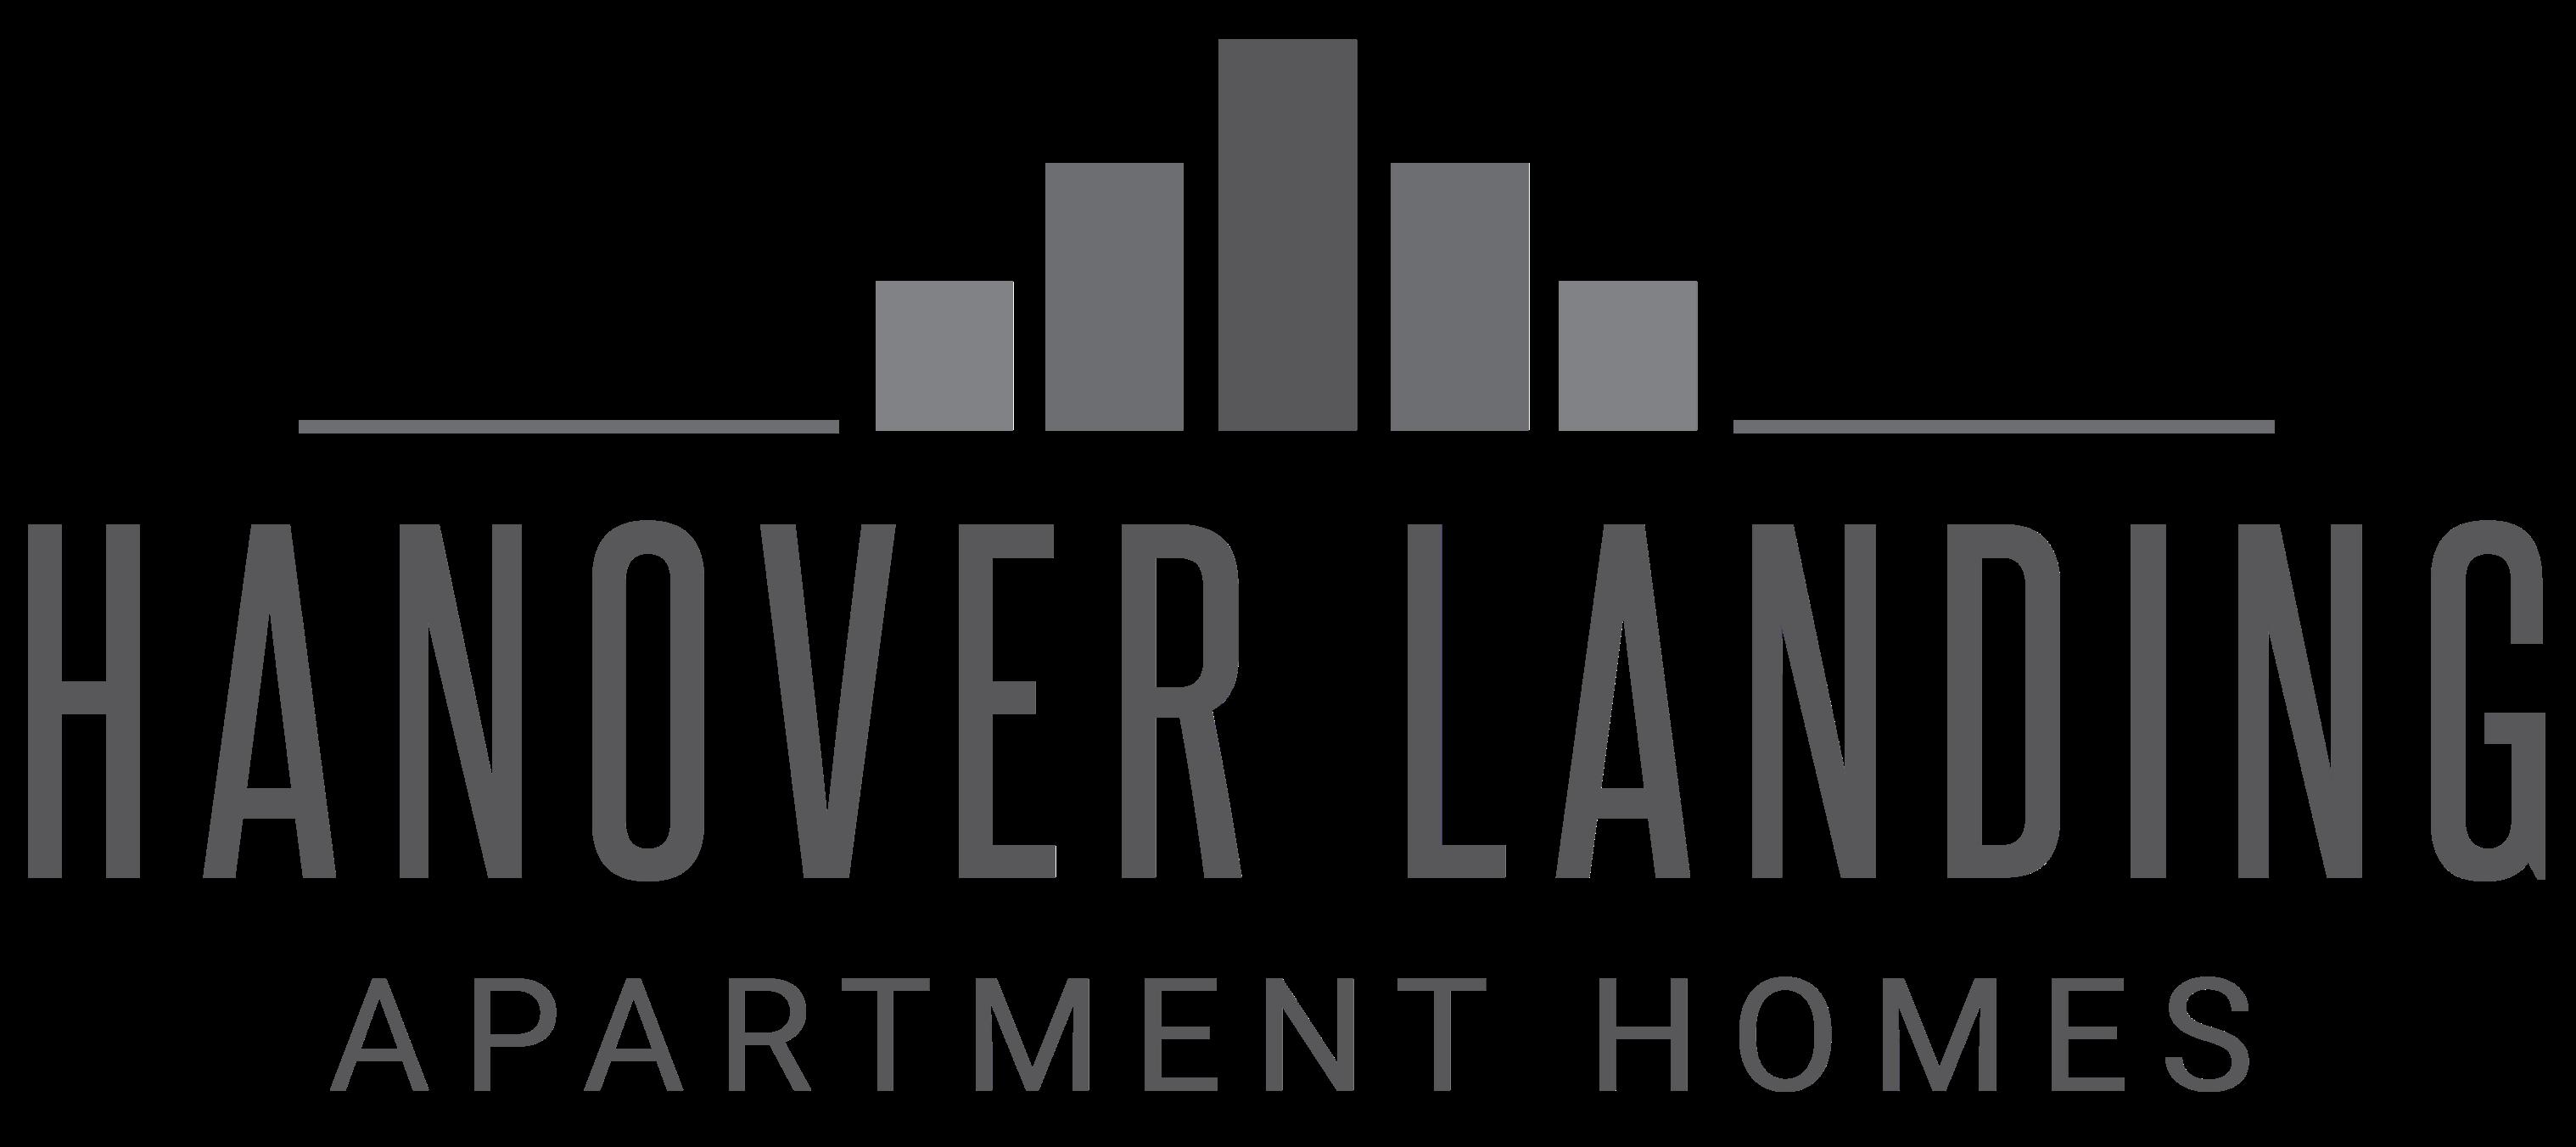 Hanover Landing Property Logo 0